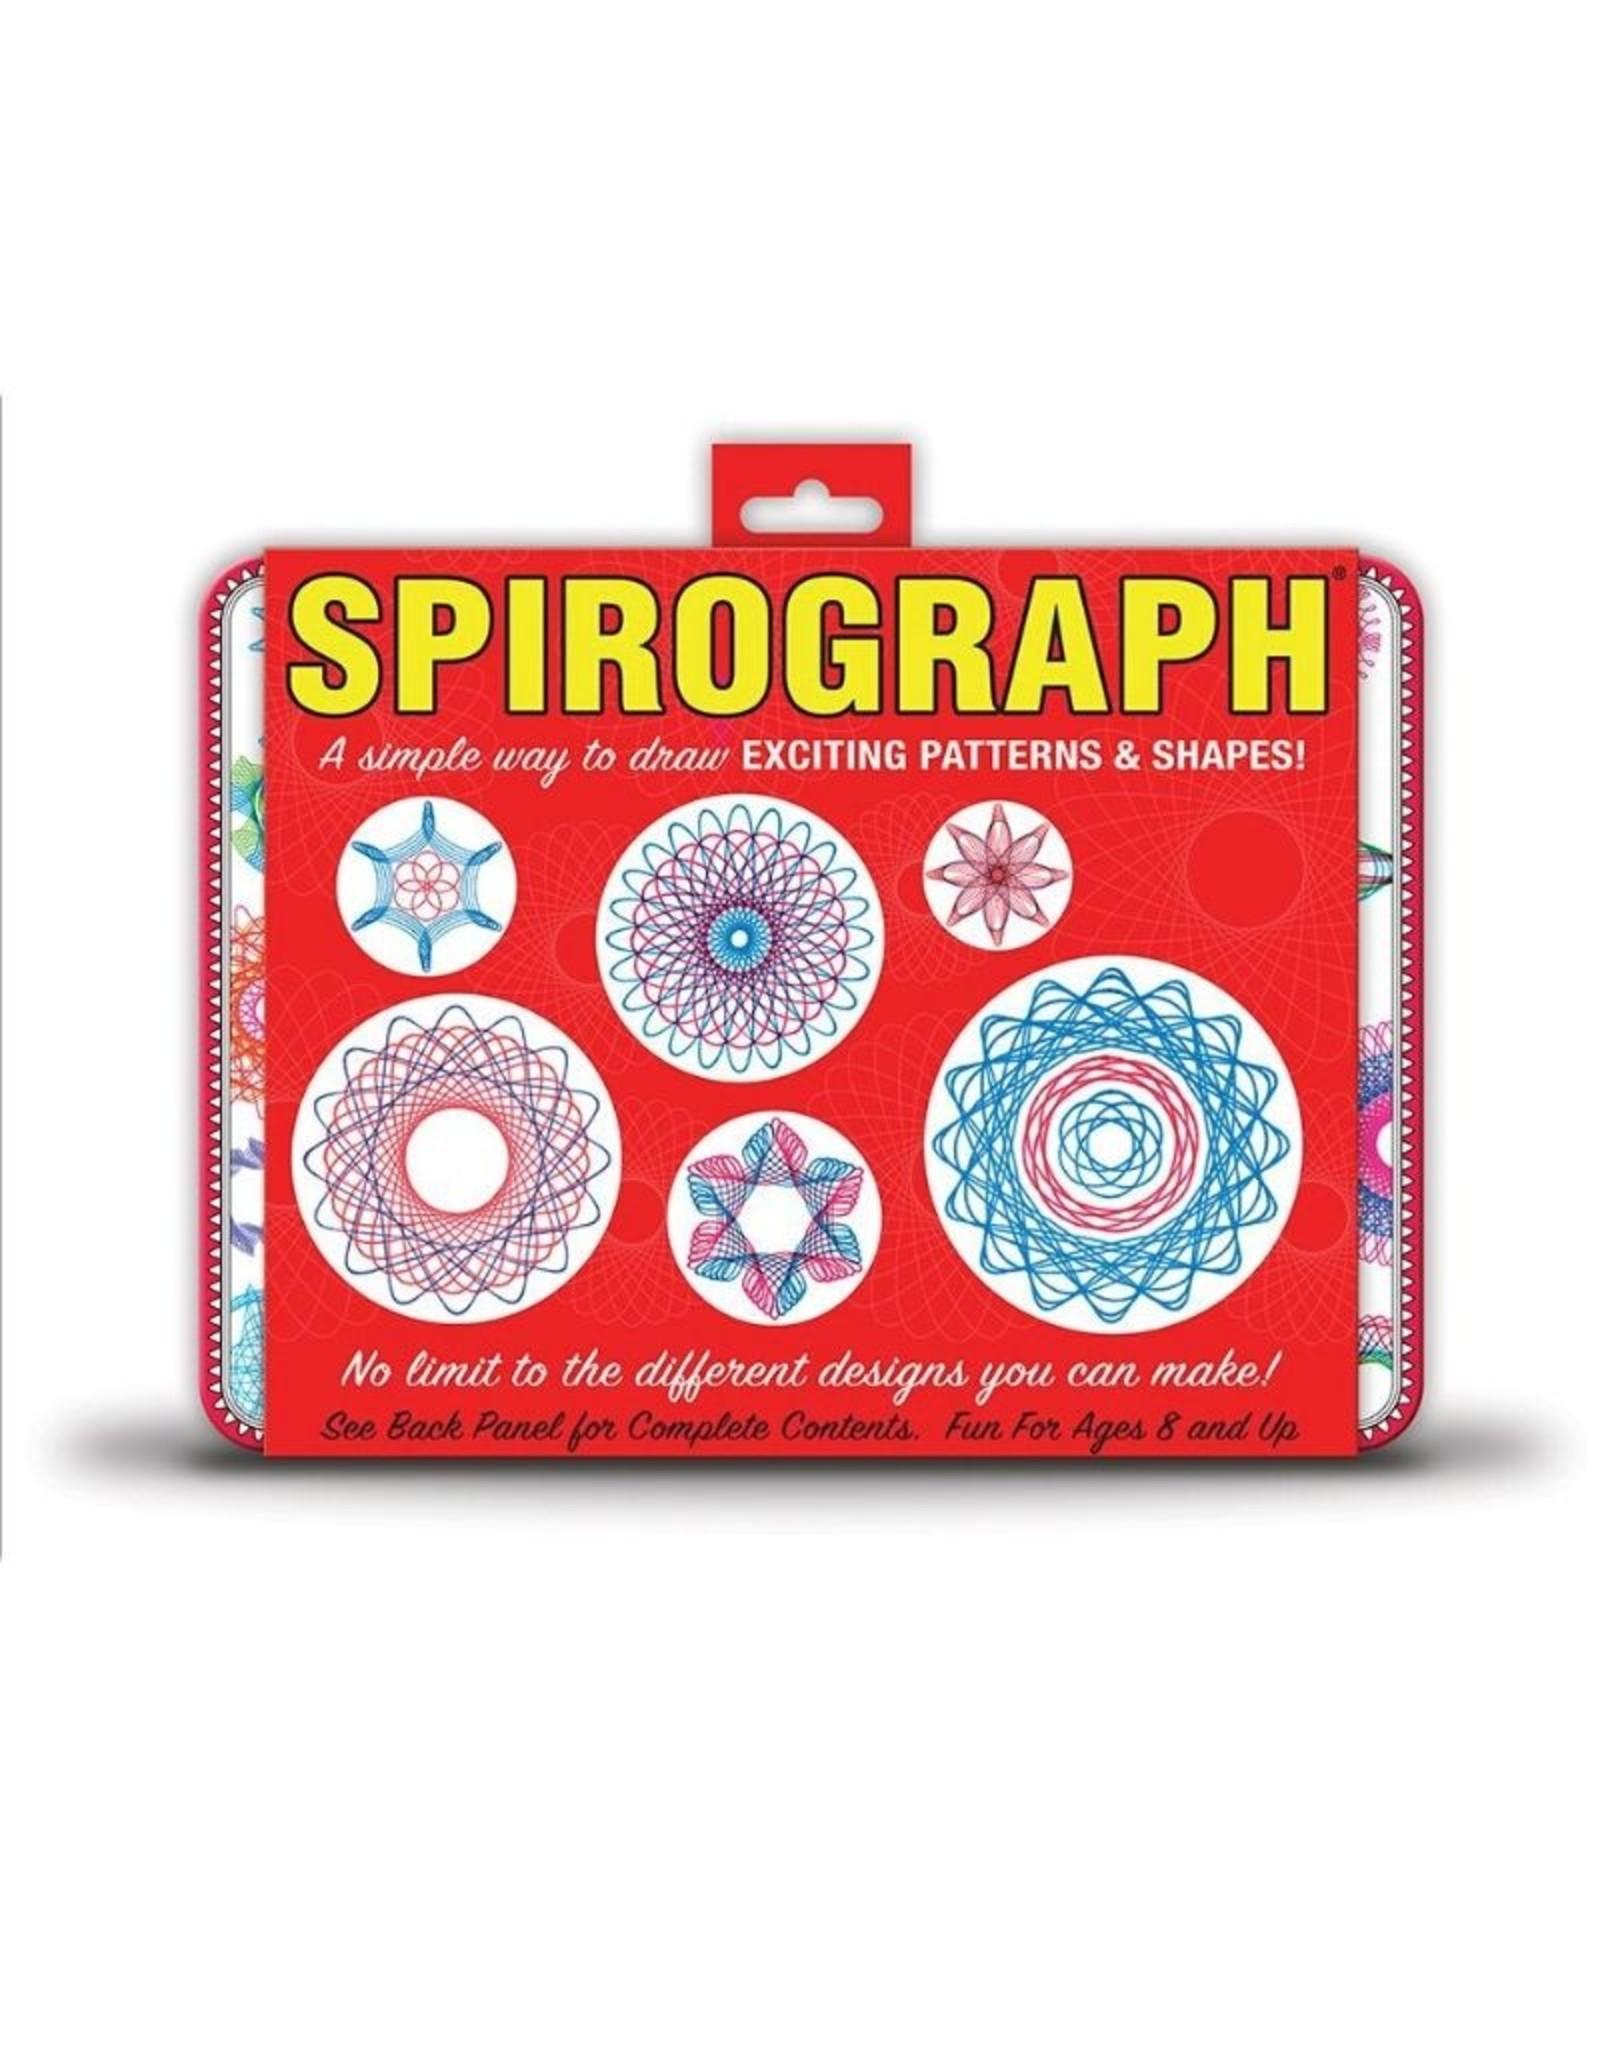 Spirograph retro